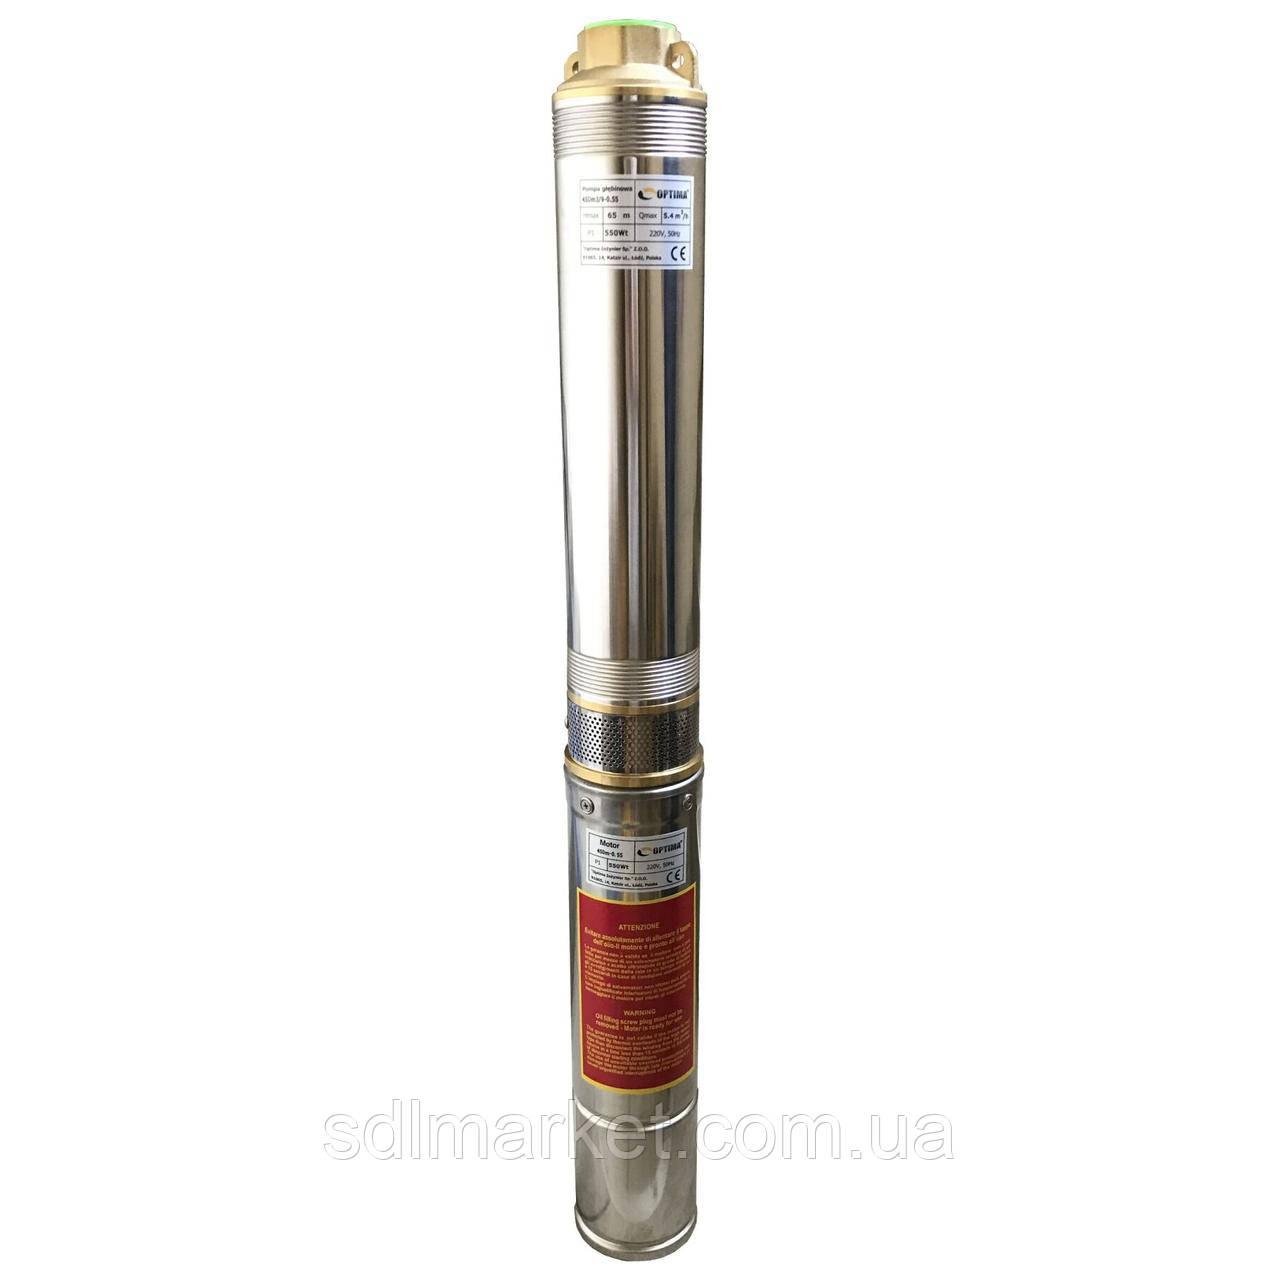 Насос свердловинний OPTIMA 4SDm6/14 1.5 кВт 88м (10795)